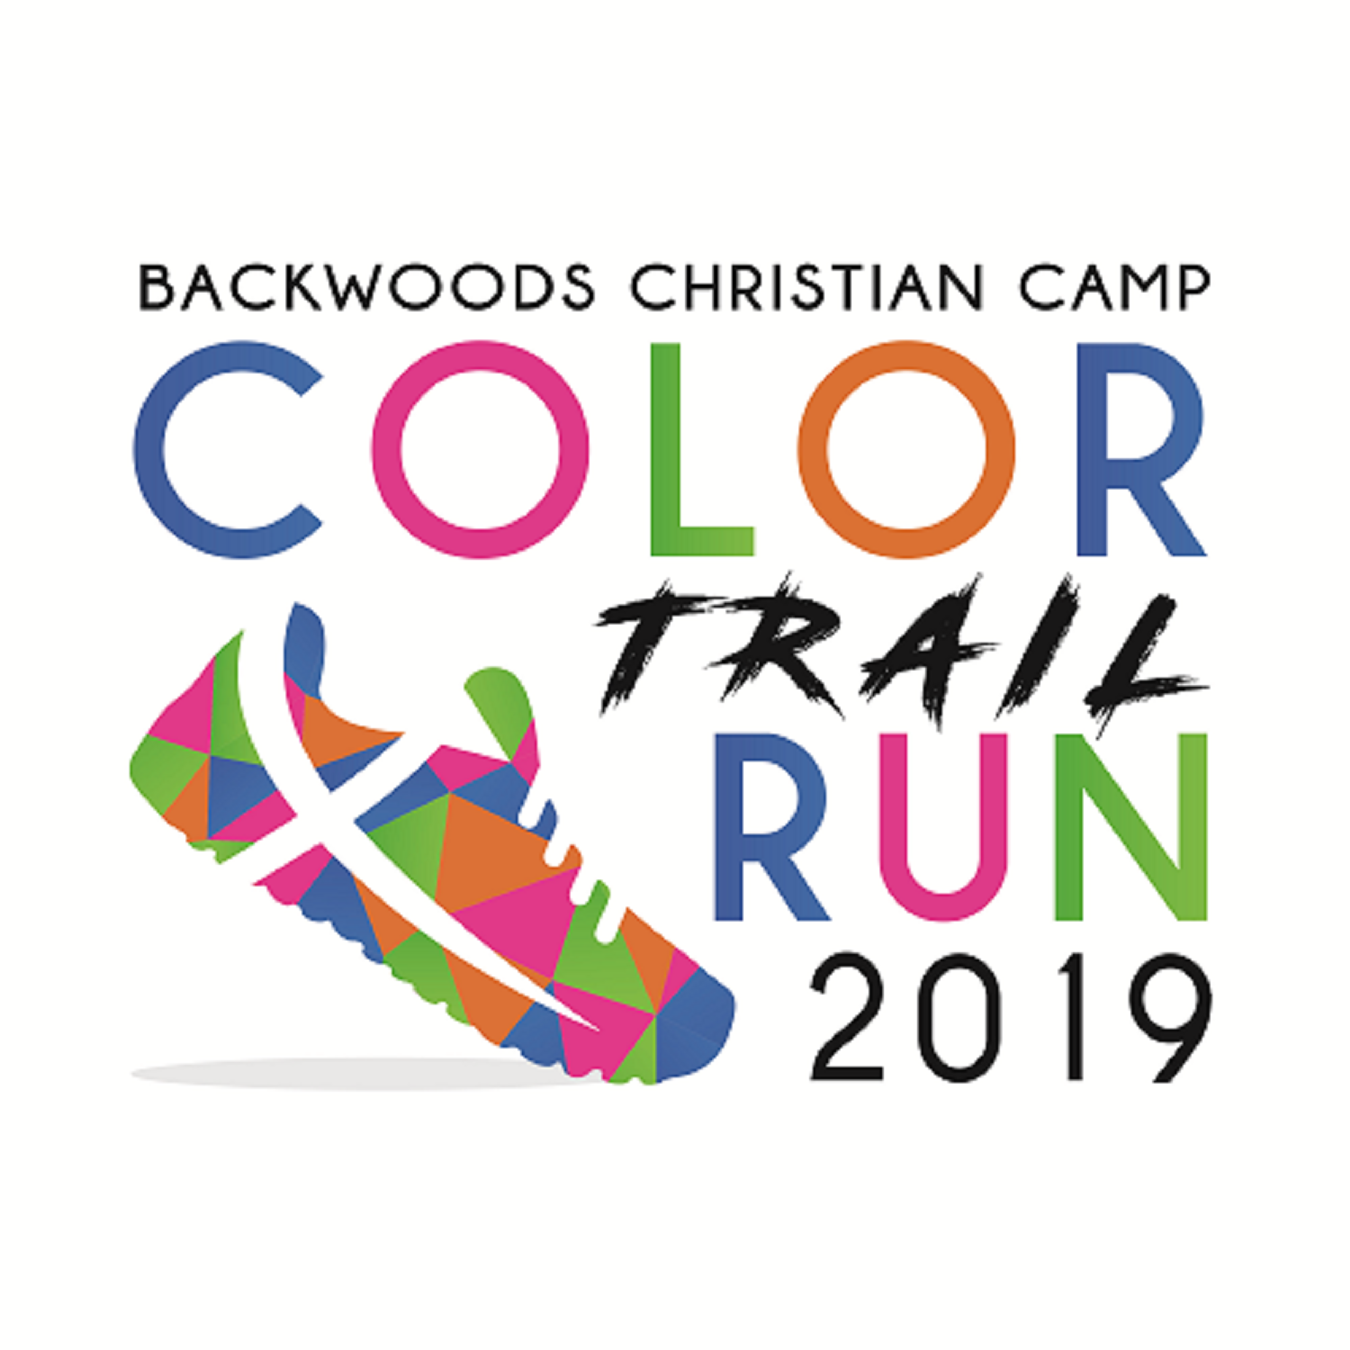 Bcc 5k Color Trail Run 1 Mile Fun Run Pelham Al 2019 Active